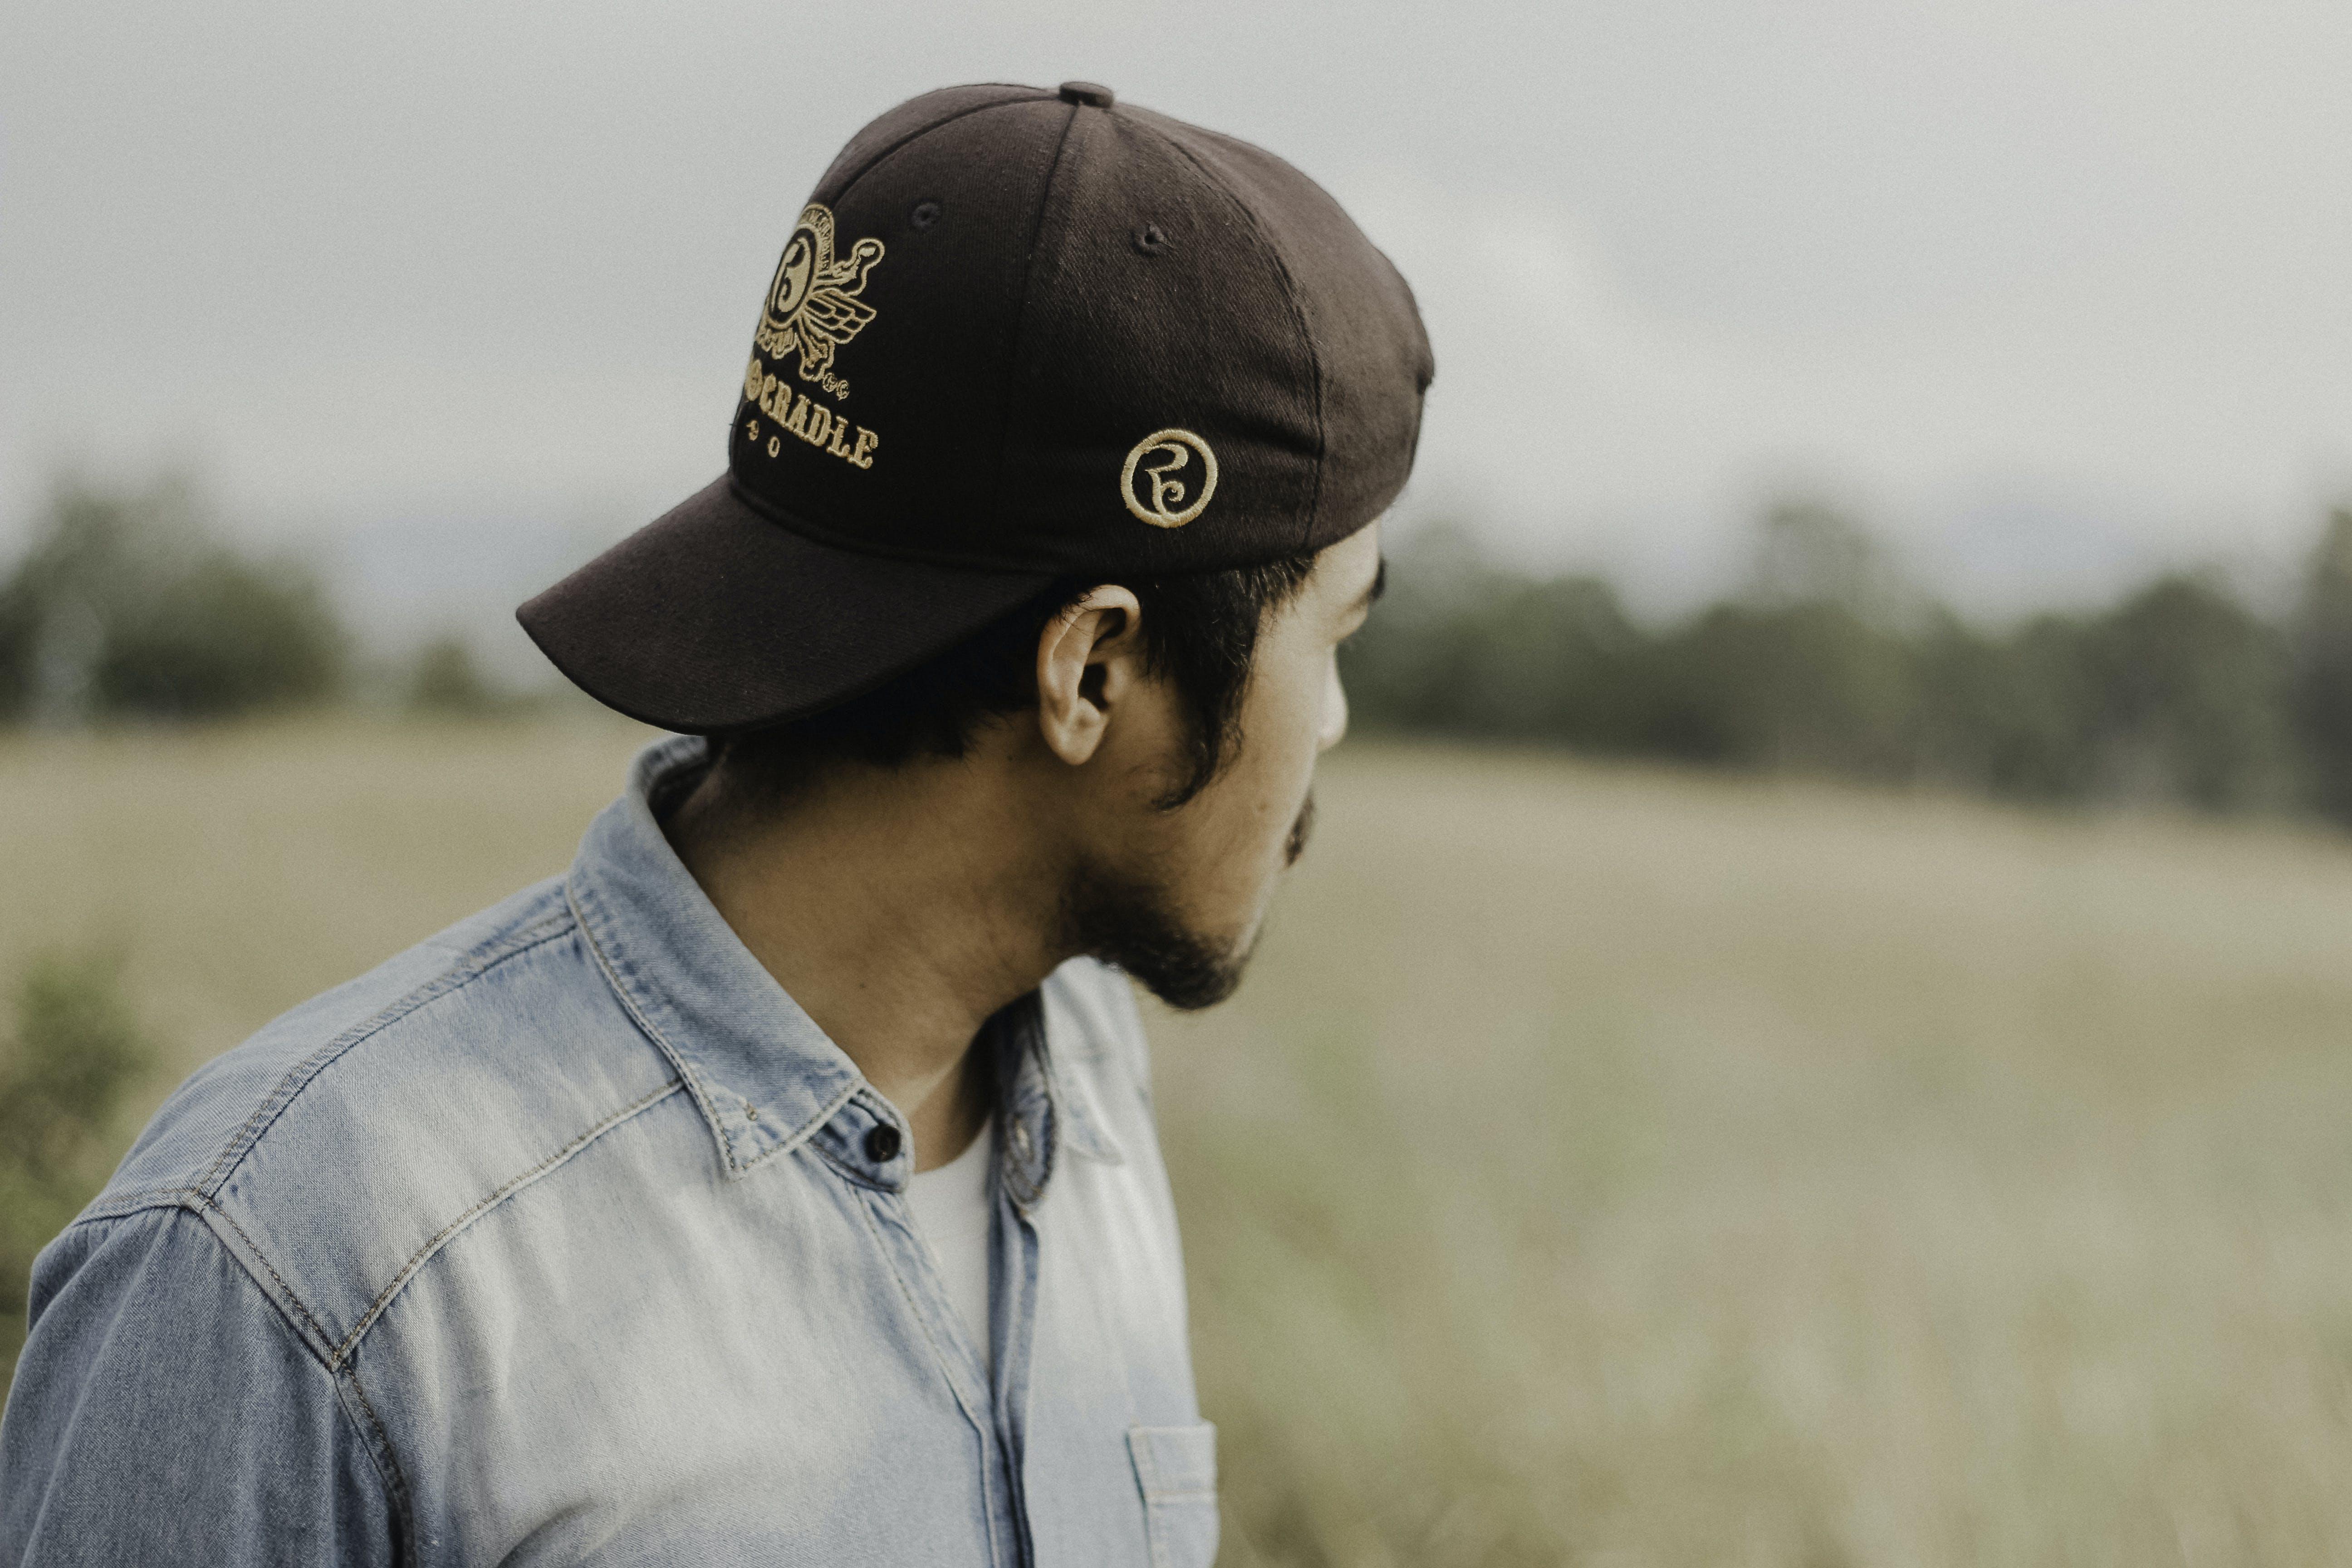 Selective Focus of Man Wearing Brown Cap